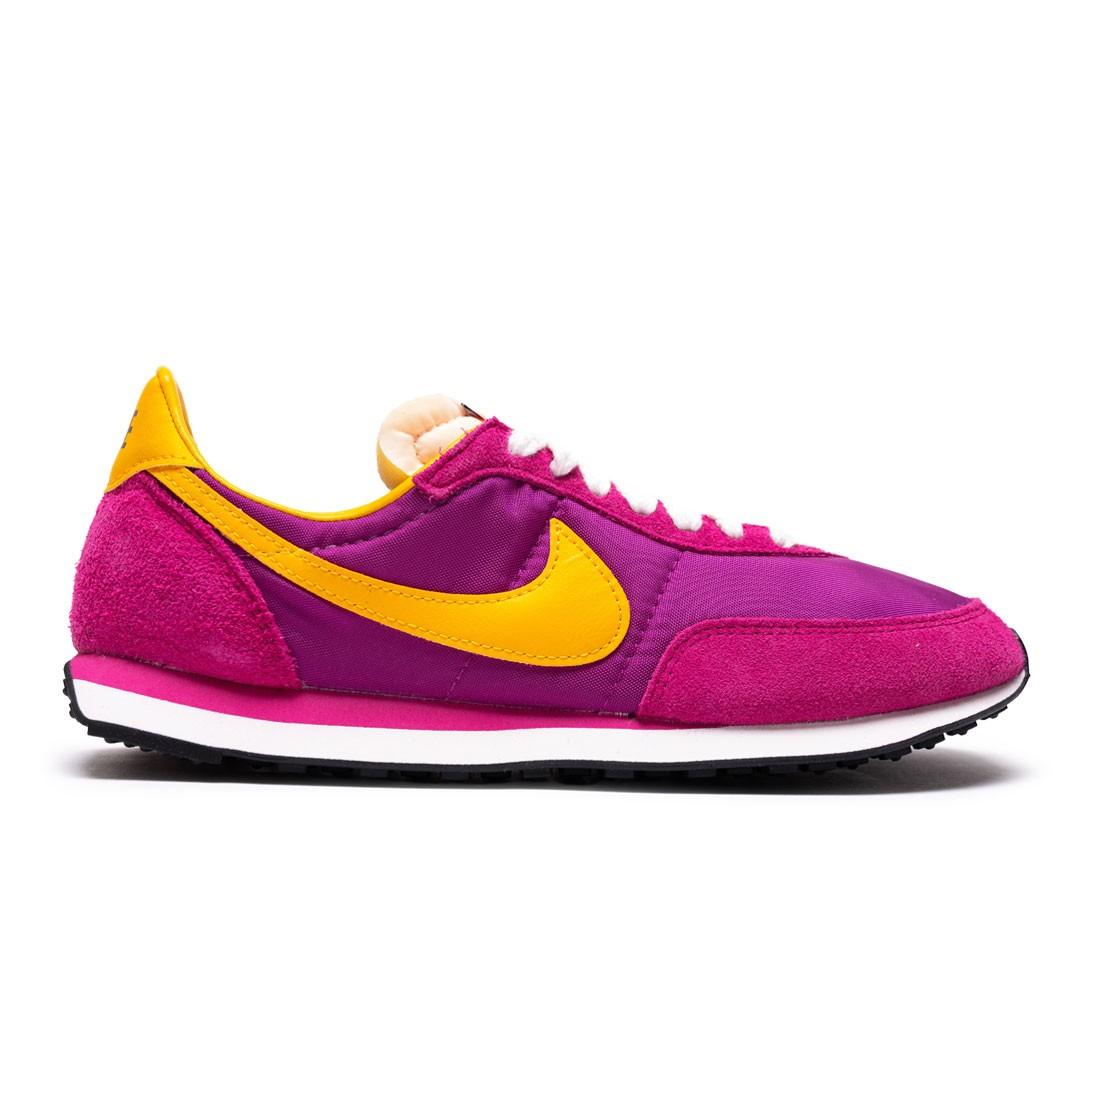 Nike Men Waffle Trainer 2 Sp (fireberry / electro orange-cactus flower)